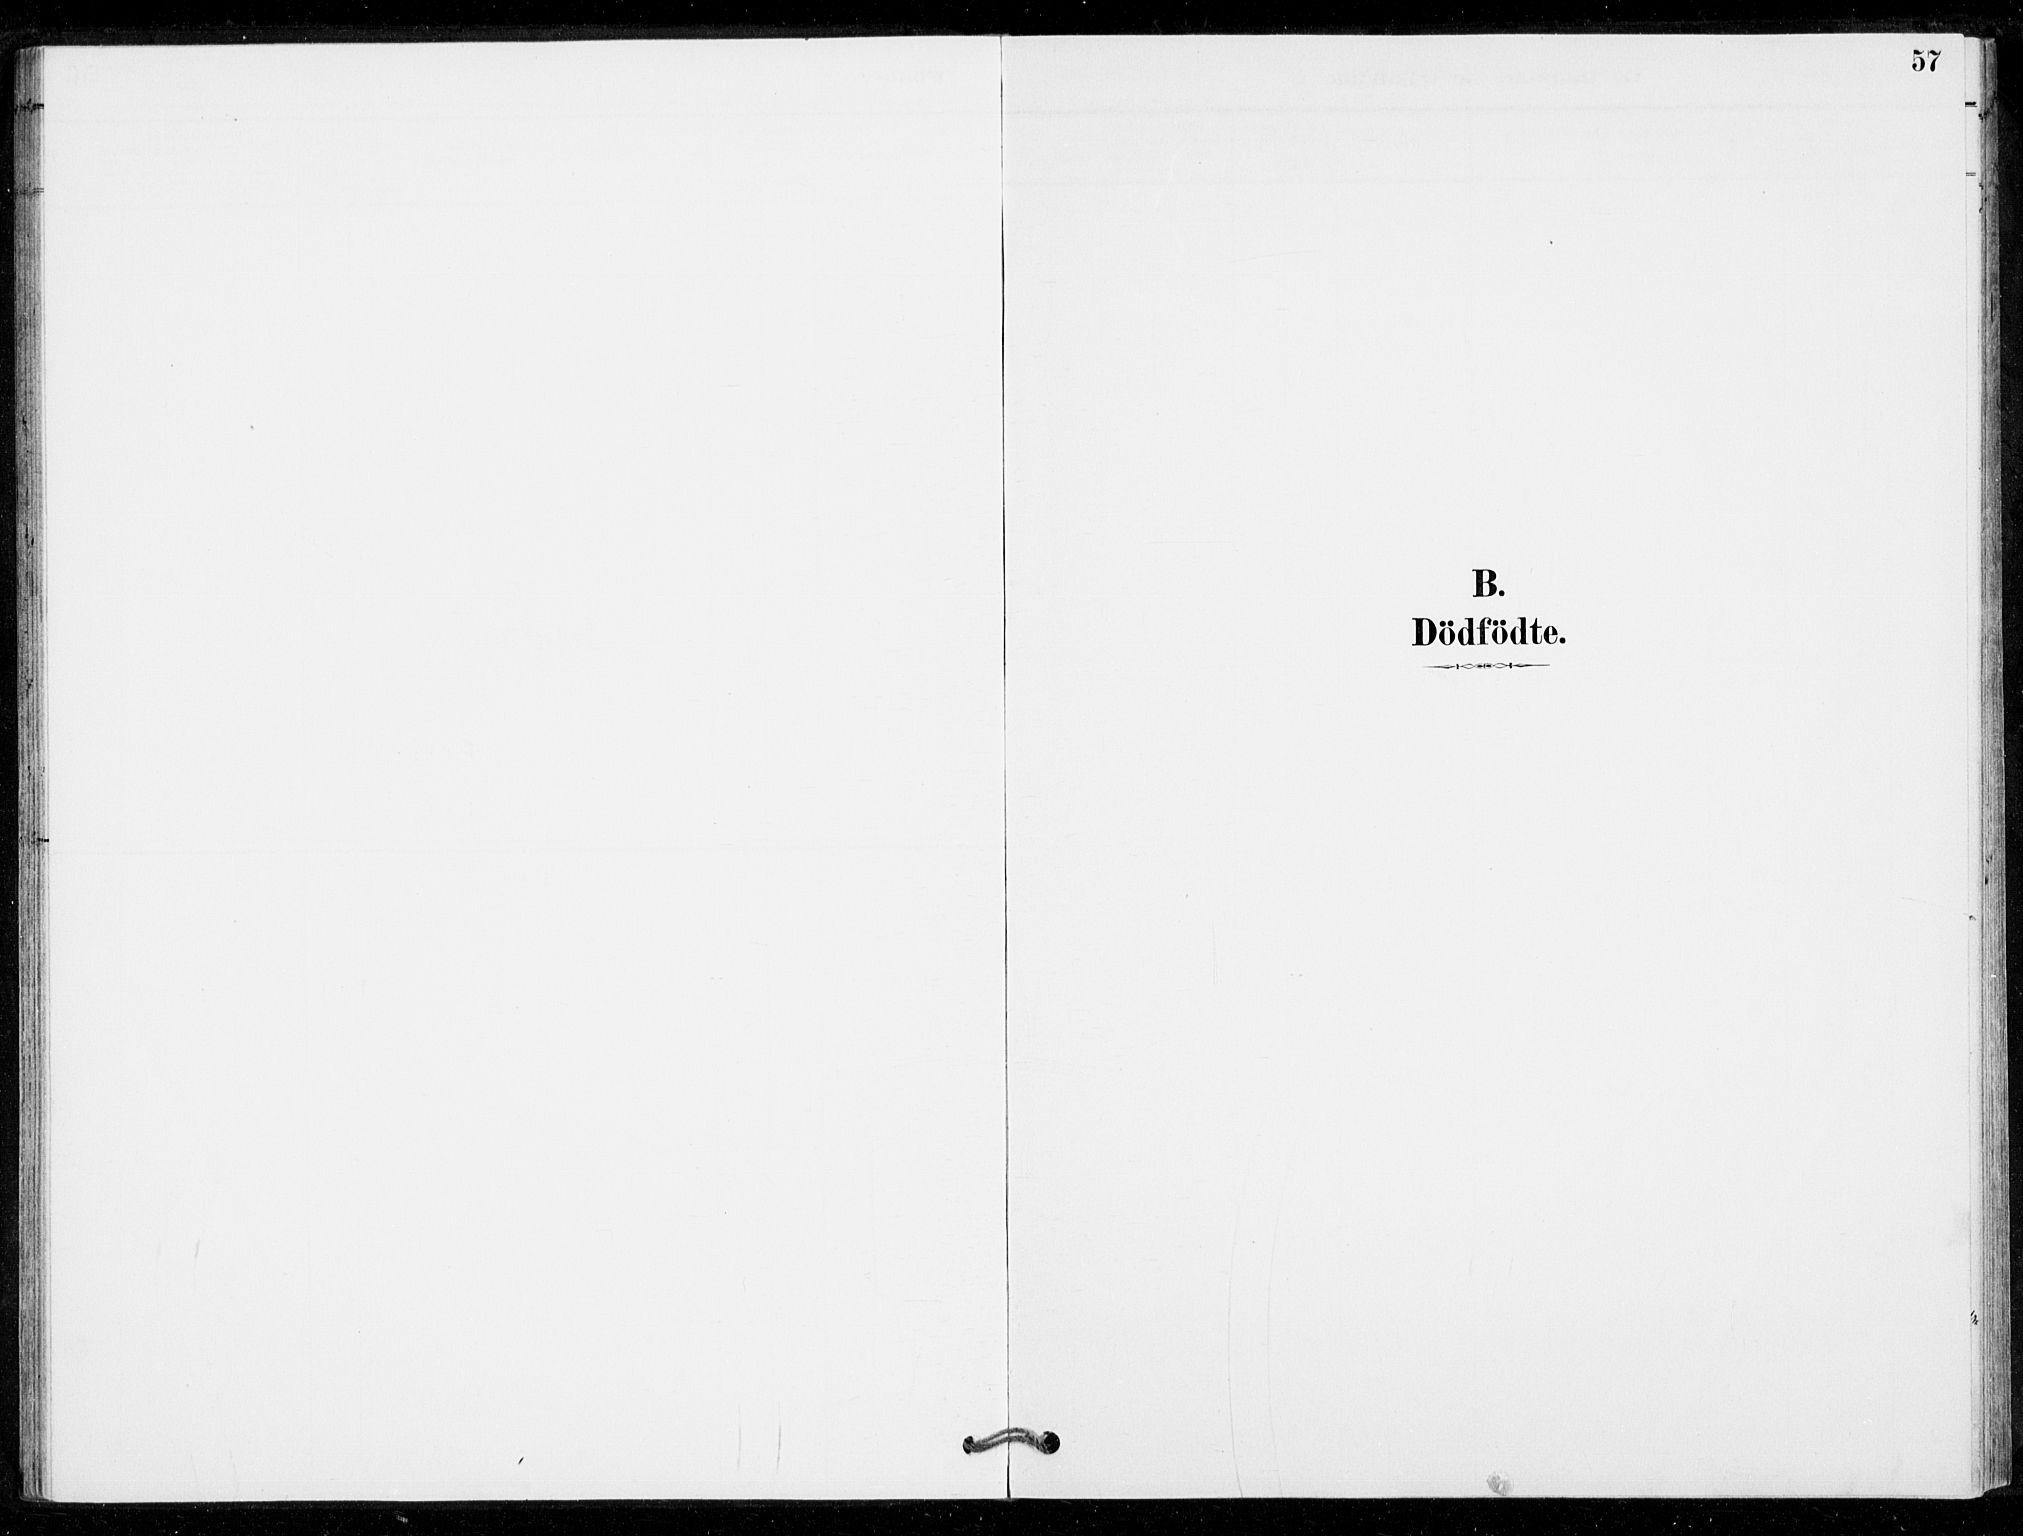 SAKO, Nore kirkebøker, G/Gc/L0003: Klokkerbok nr. III 3, 1881-1941, s. 57